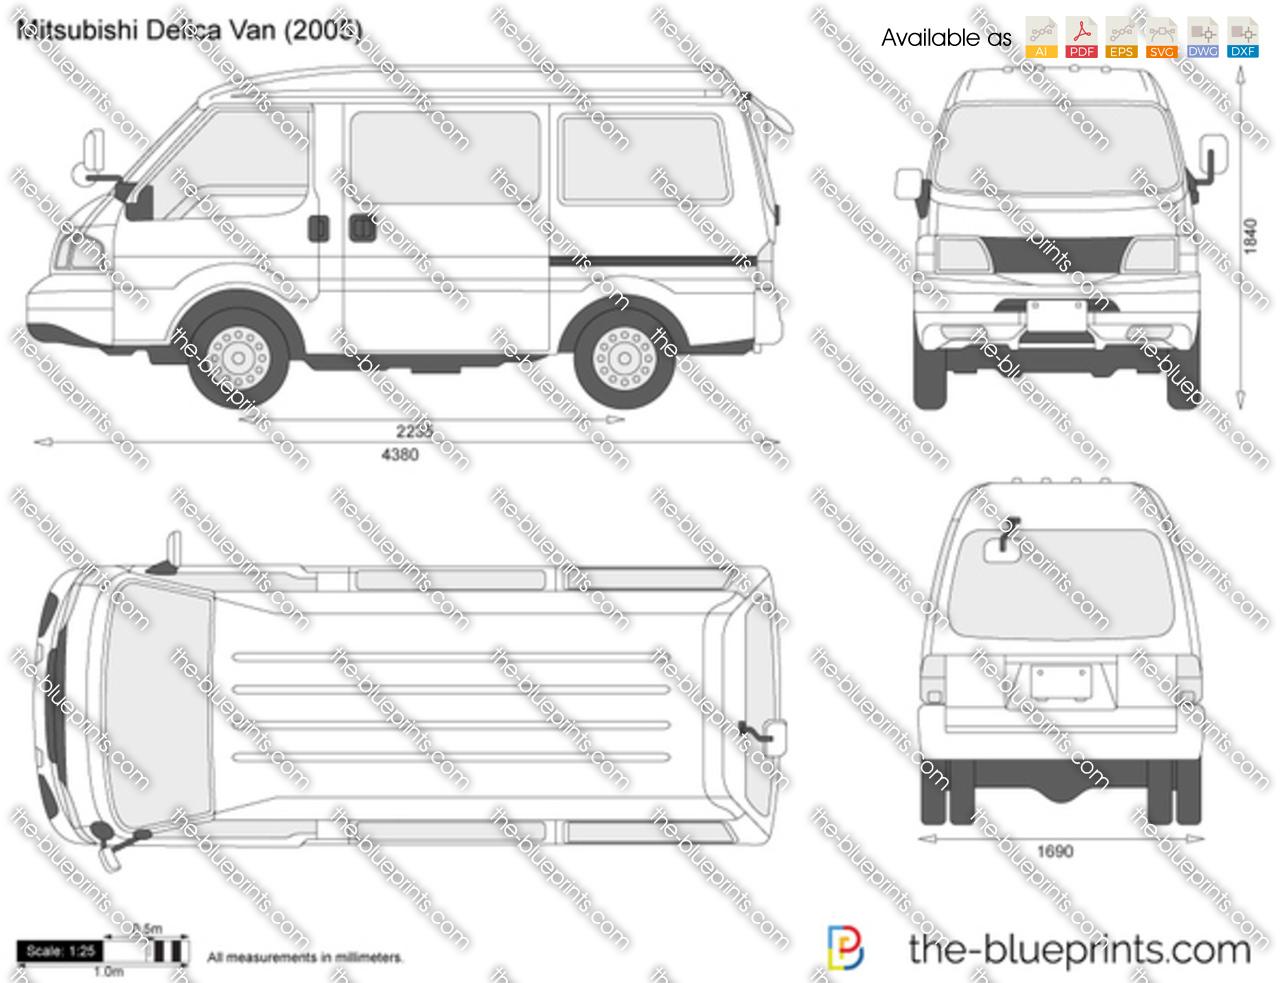 Mitsubishi Delica Van 2009